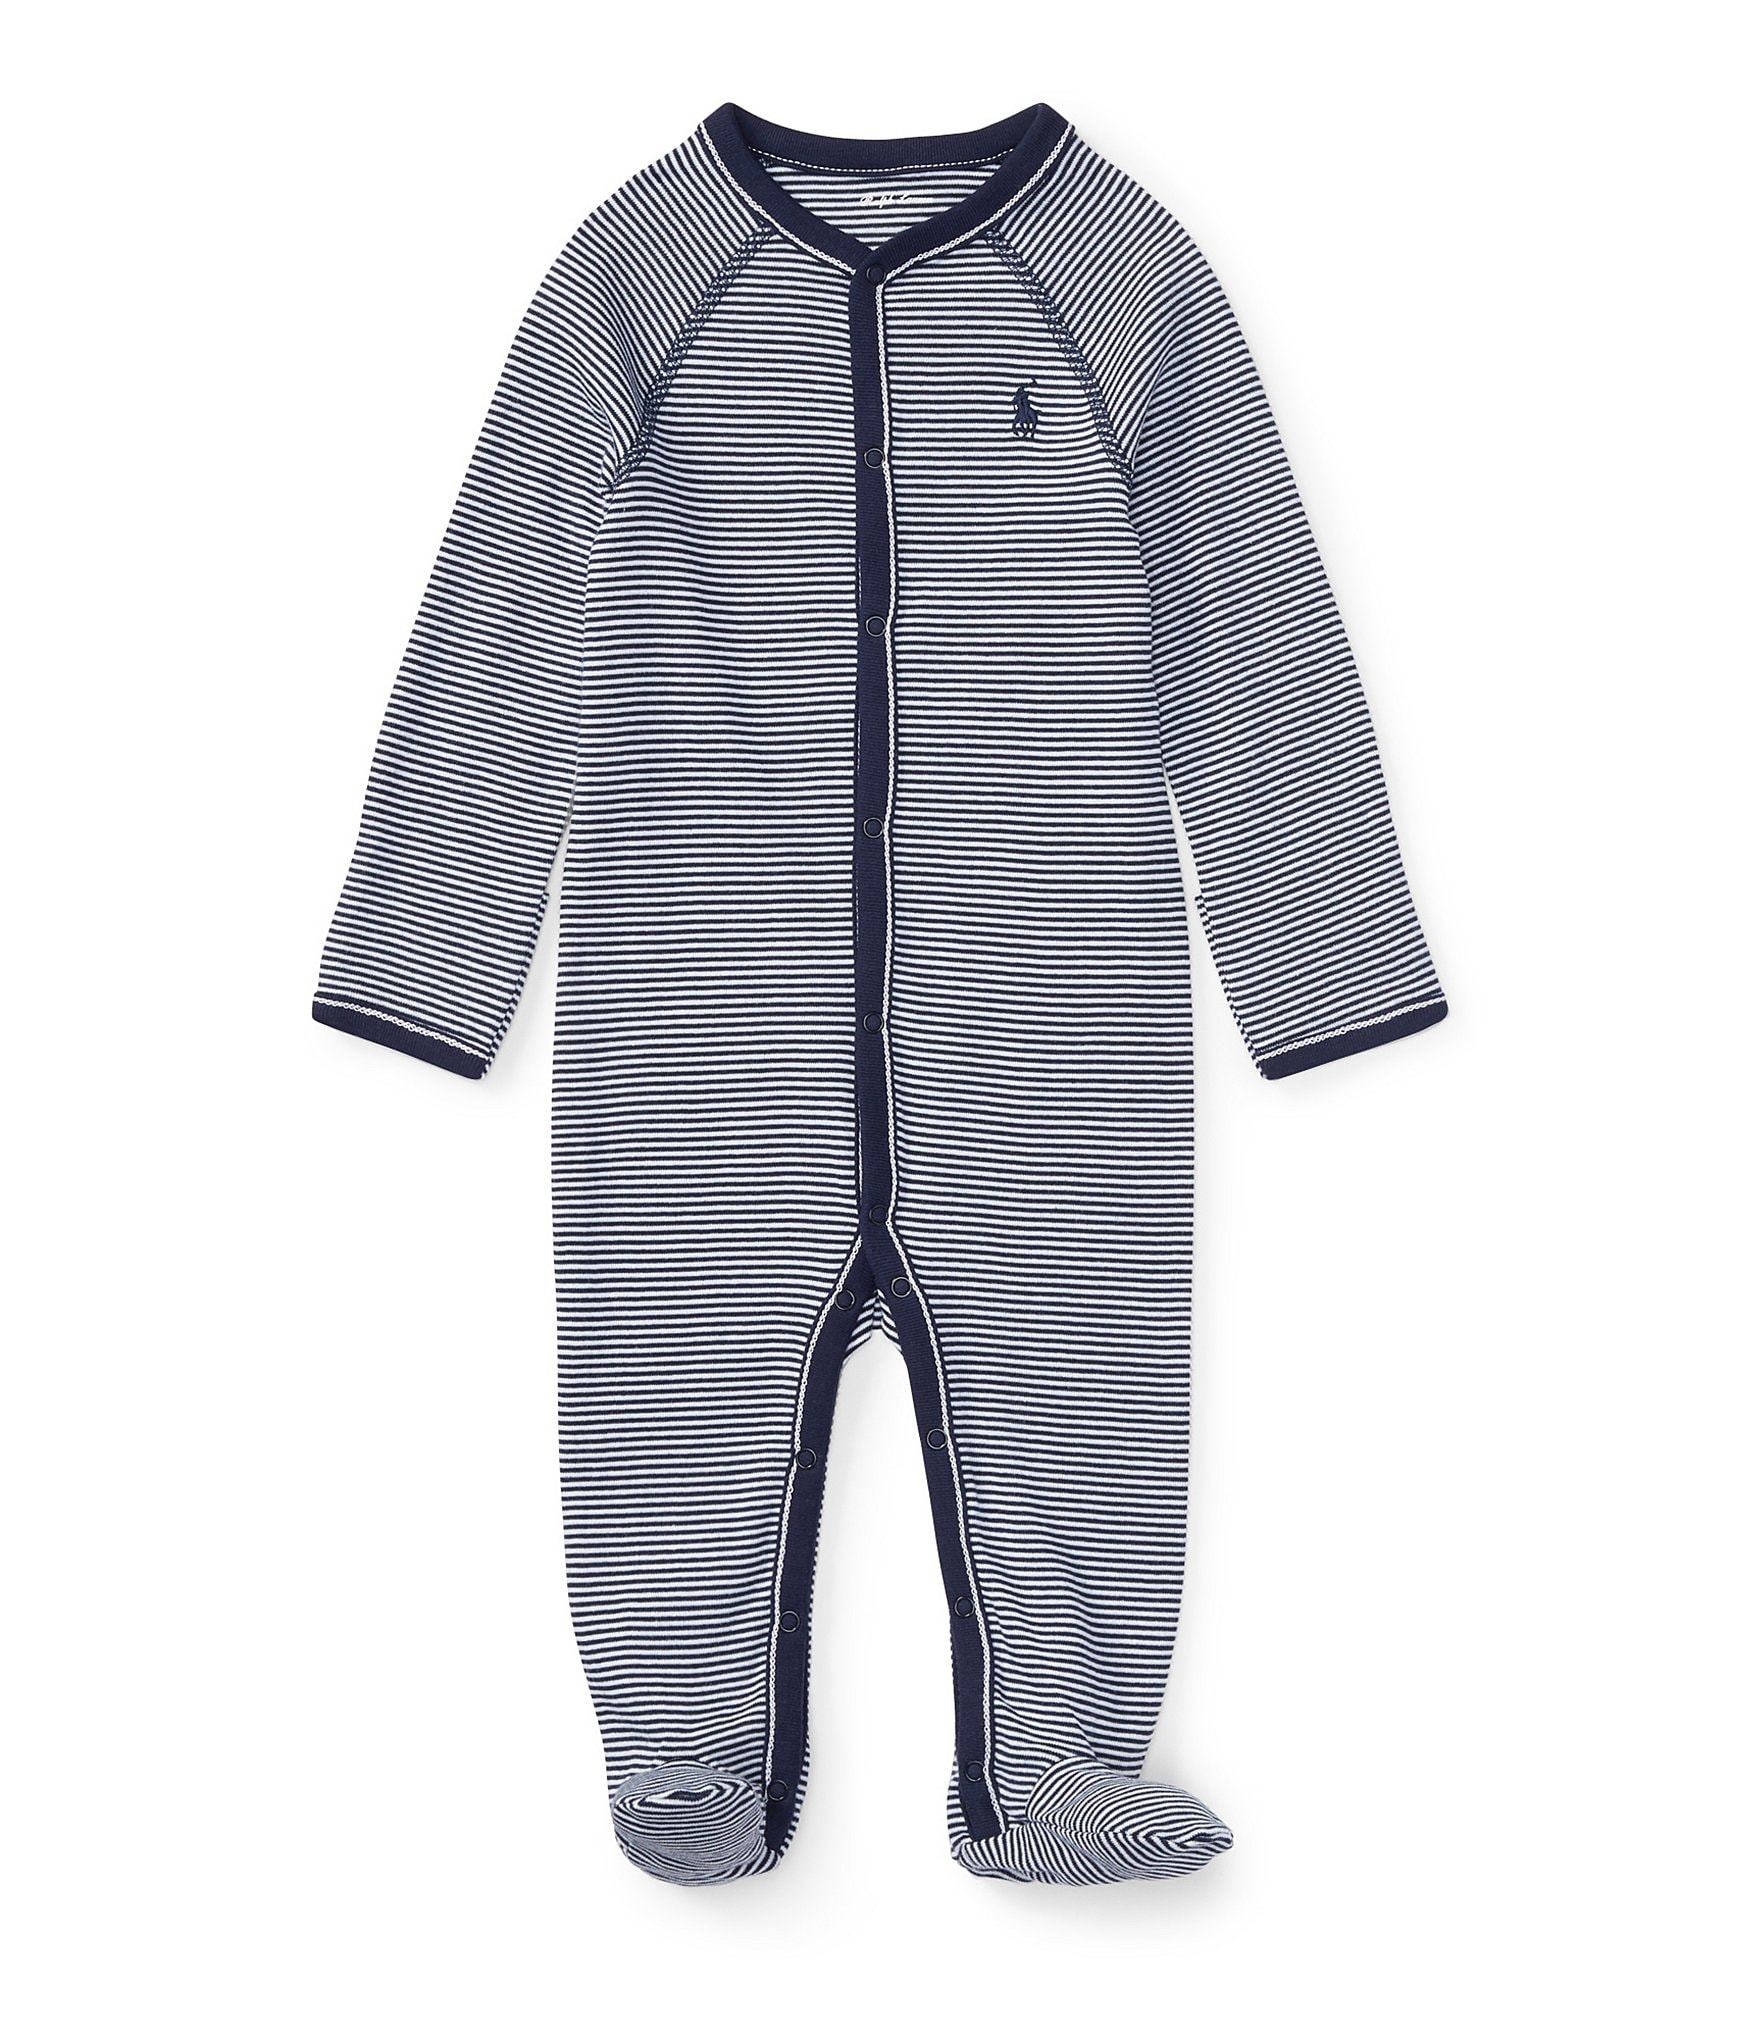 6395de99d Baby Boy Outfits & Clothing Sets | Dillard's